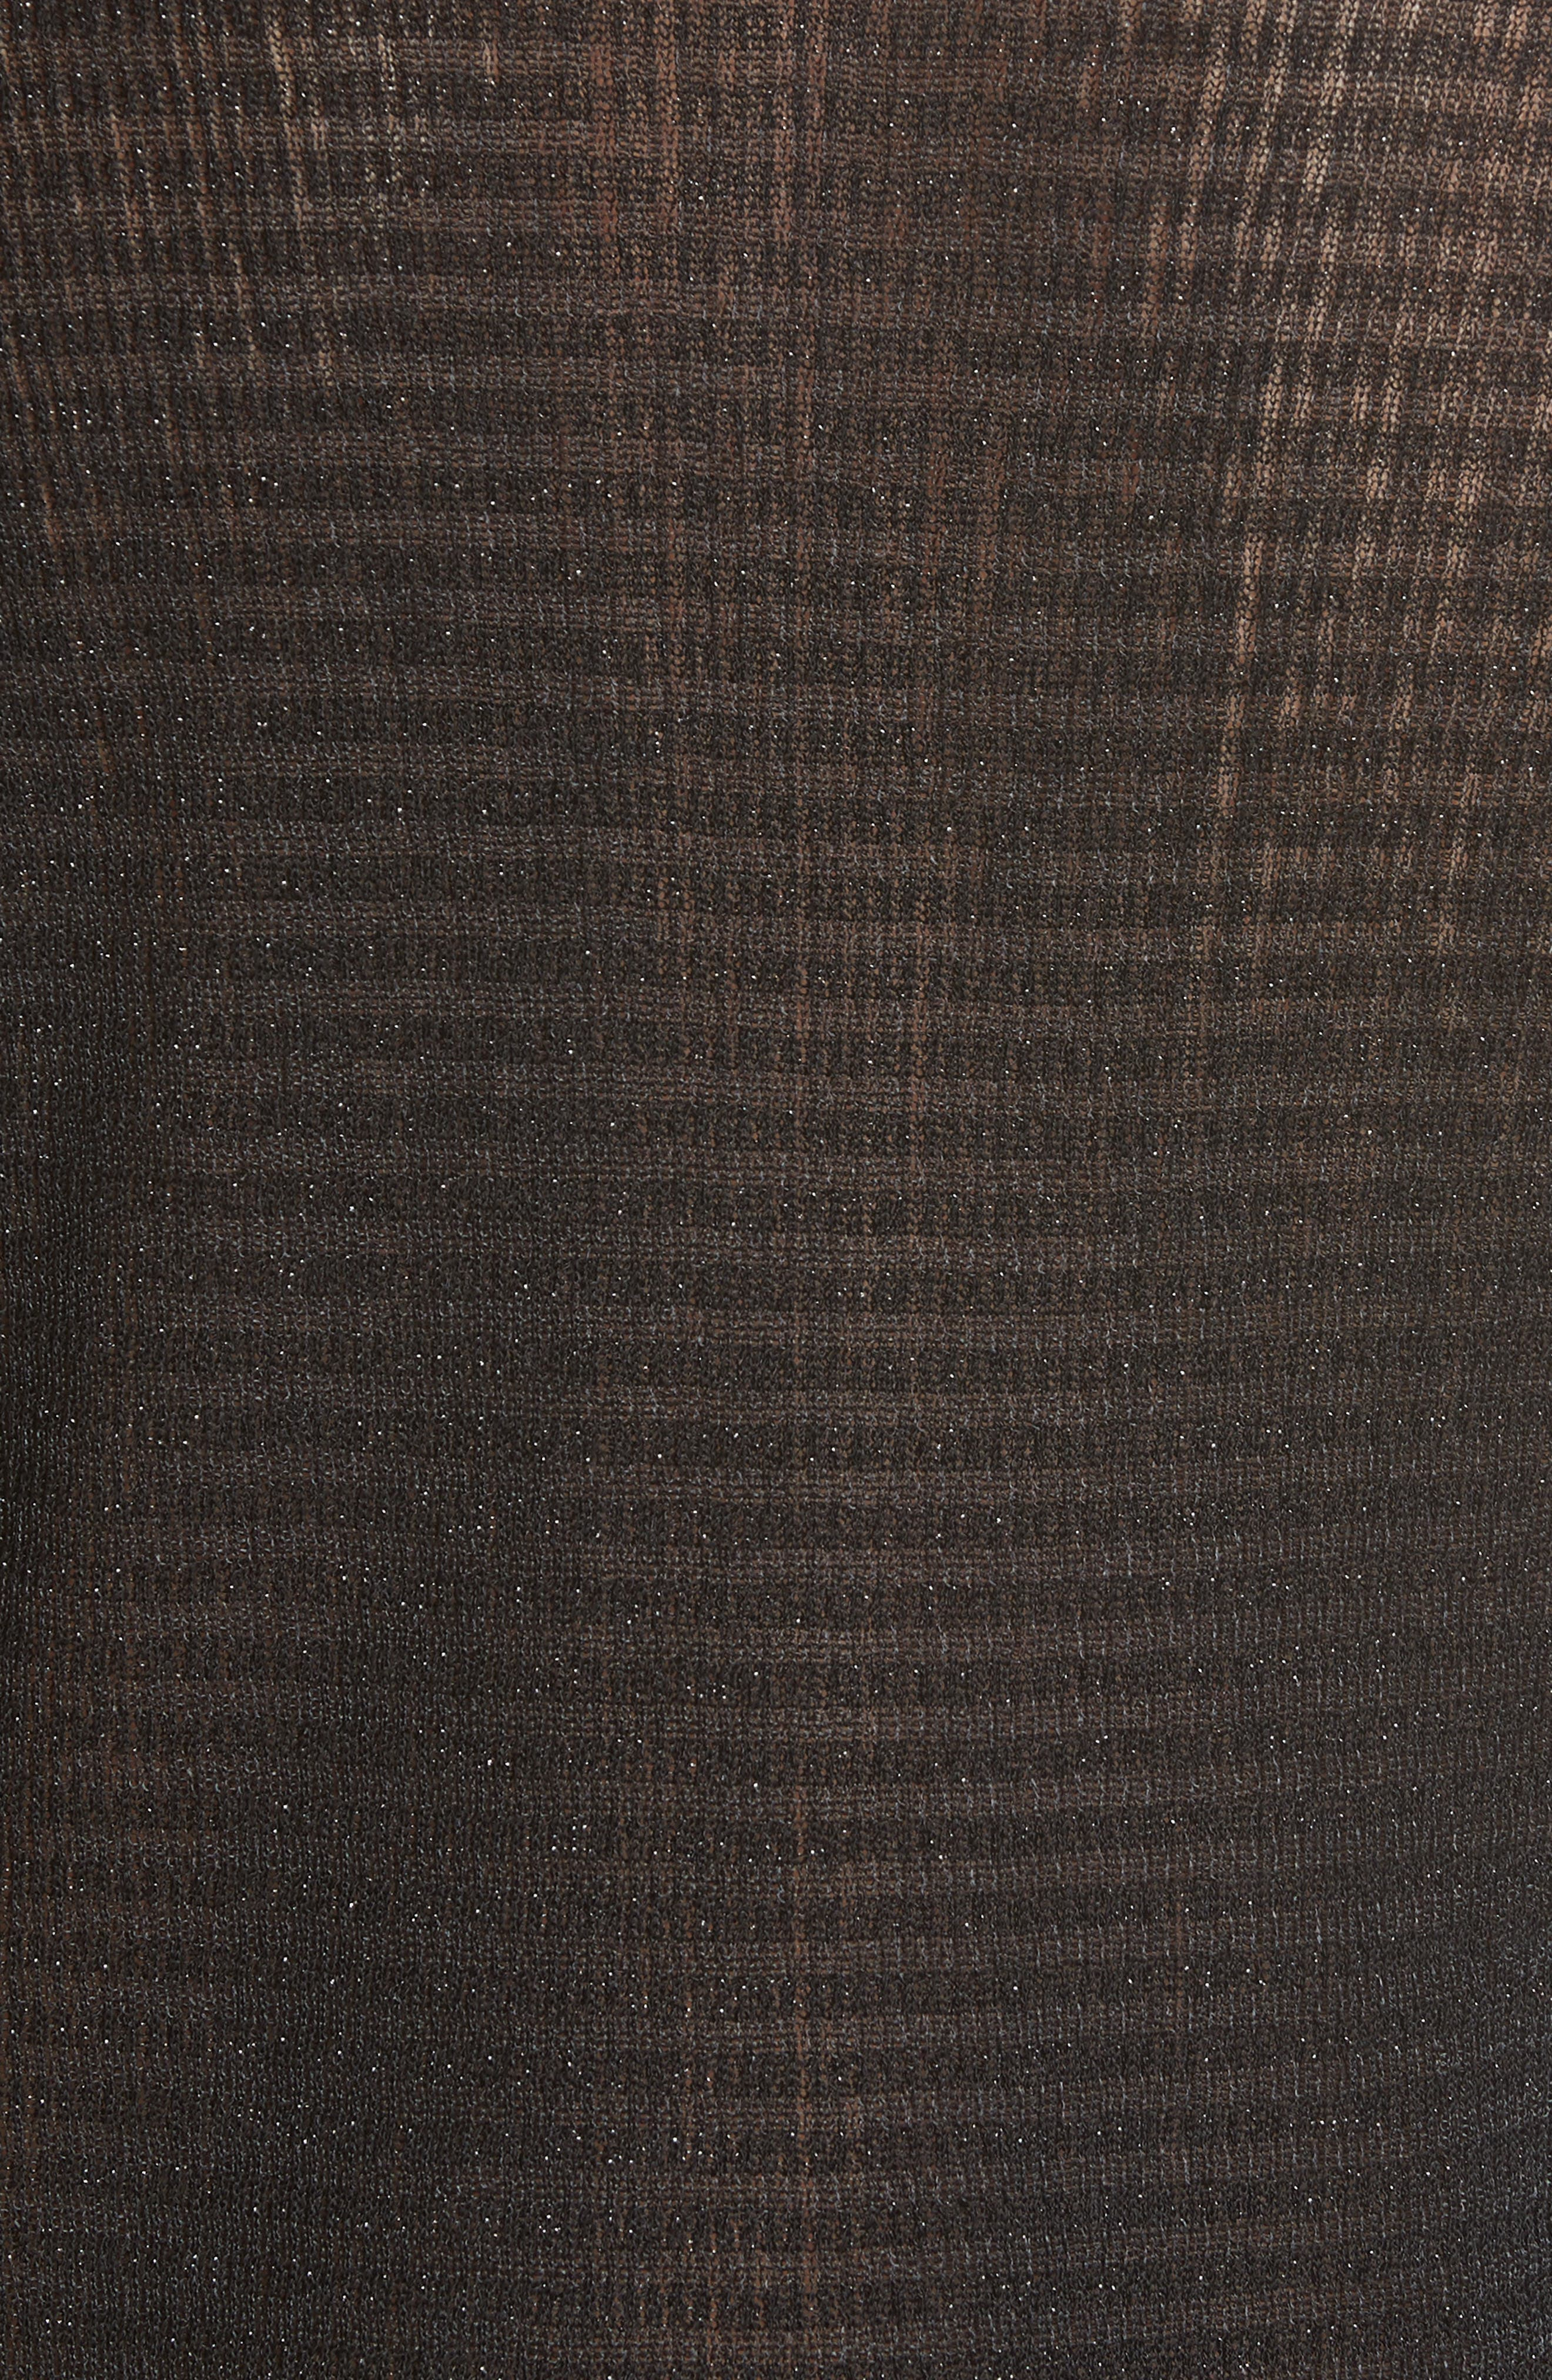 RAG & BONE, Raina Metallic Stripe Tank Top, Alternate thumbnail 5, color, BLACK